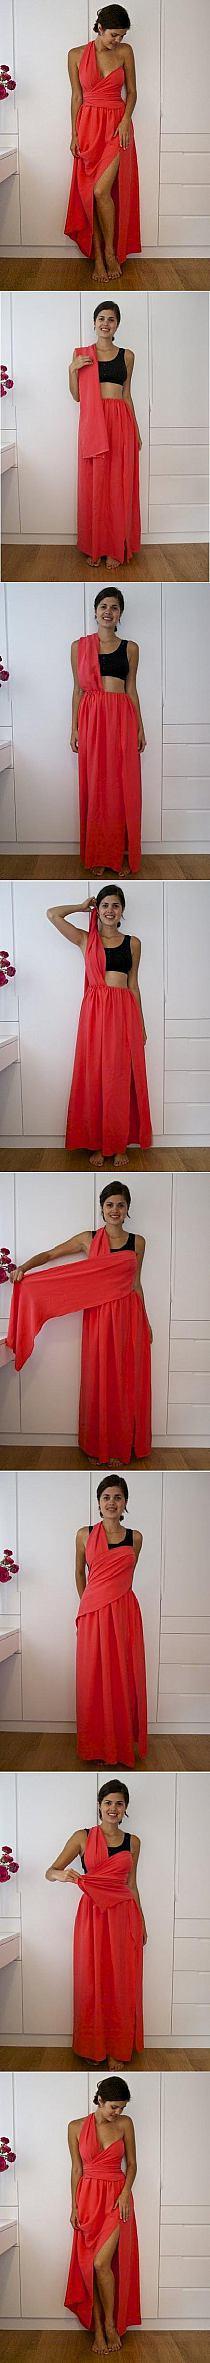 Diy no sew dress diy projects usefuldiy stuff i want to make diy clothing solutioingenieria Images